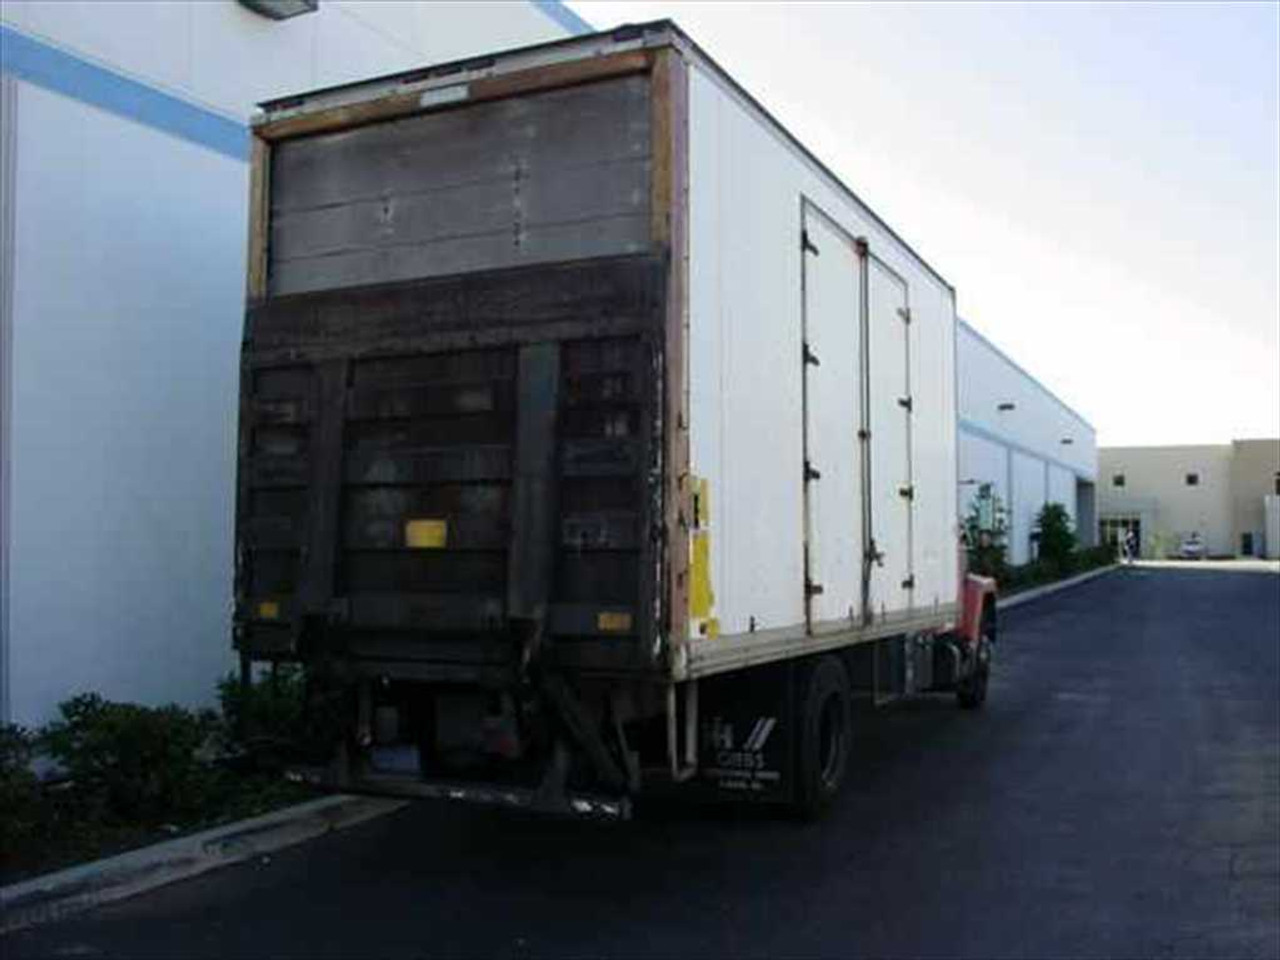 international s1900 box 1984 box truck with waltco lift gate